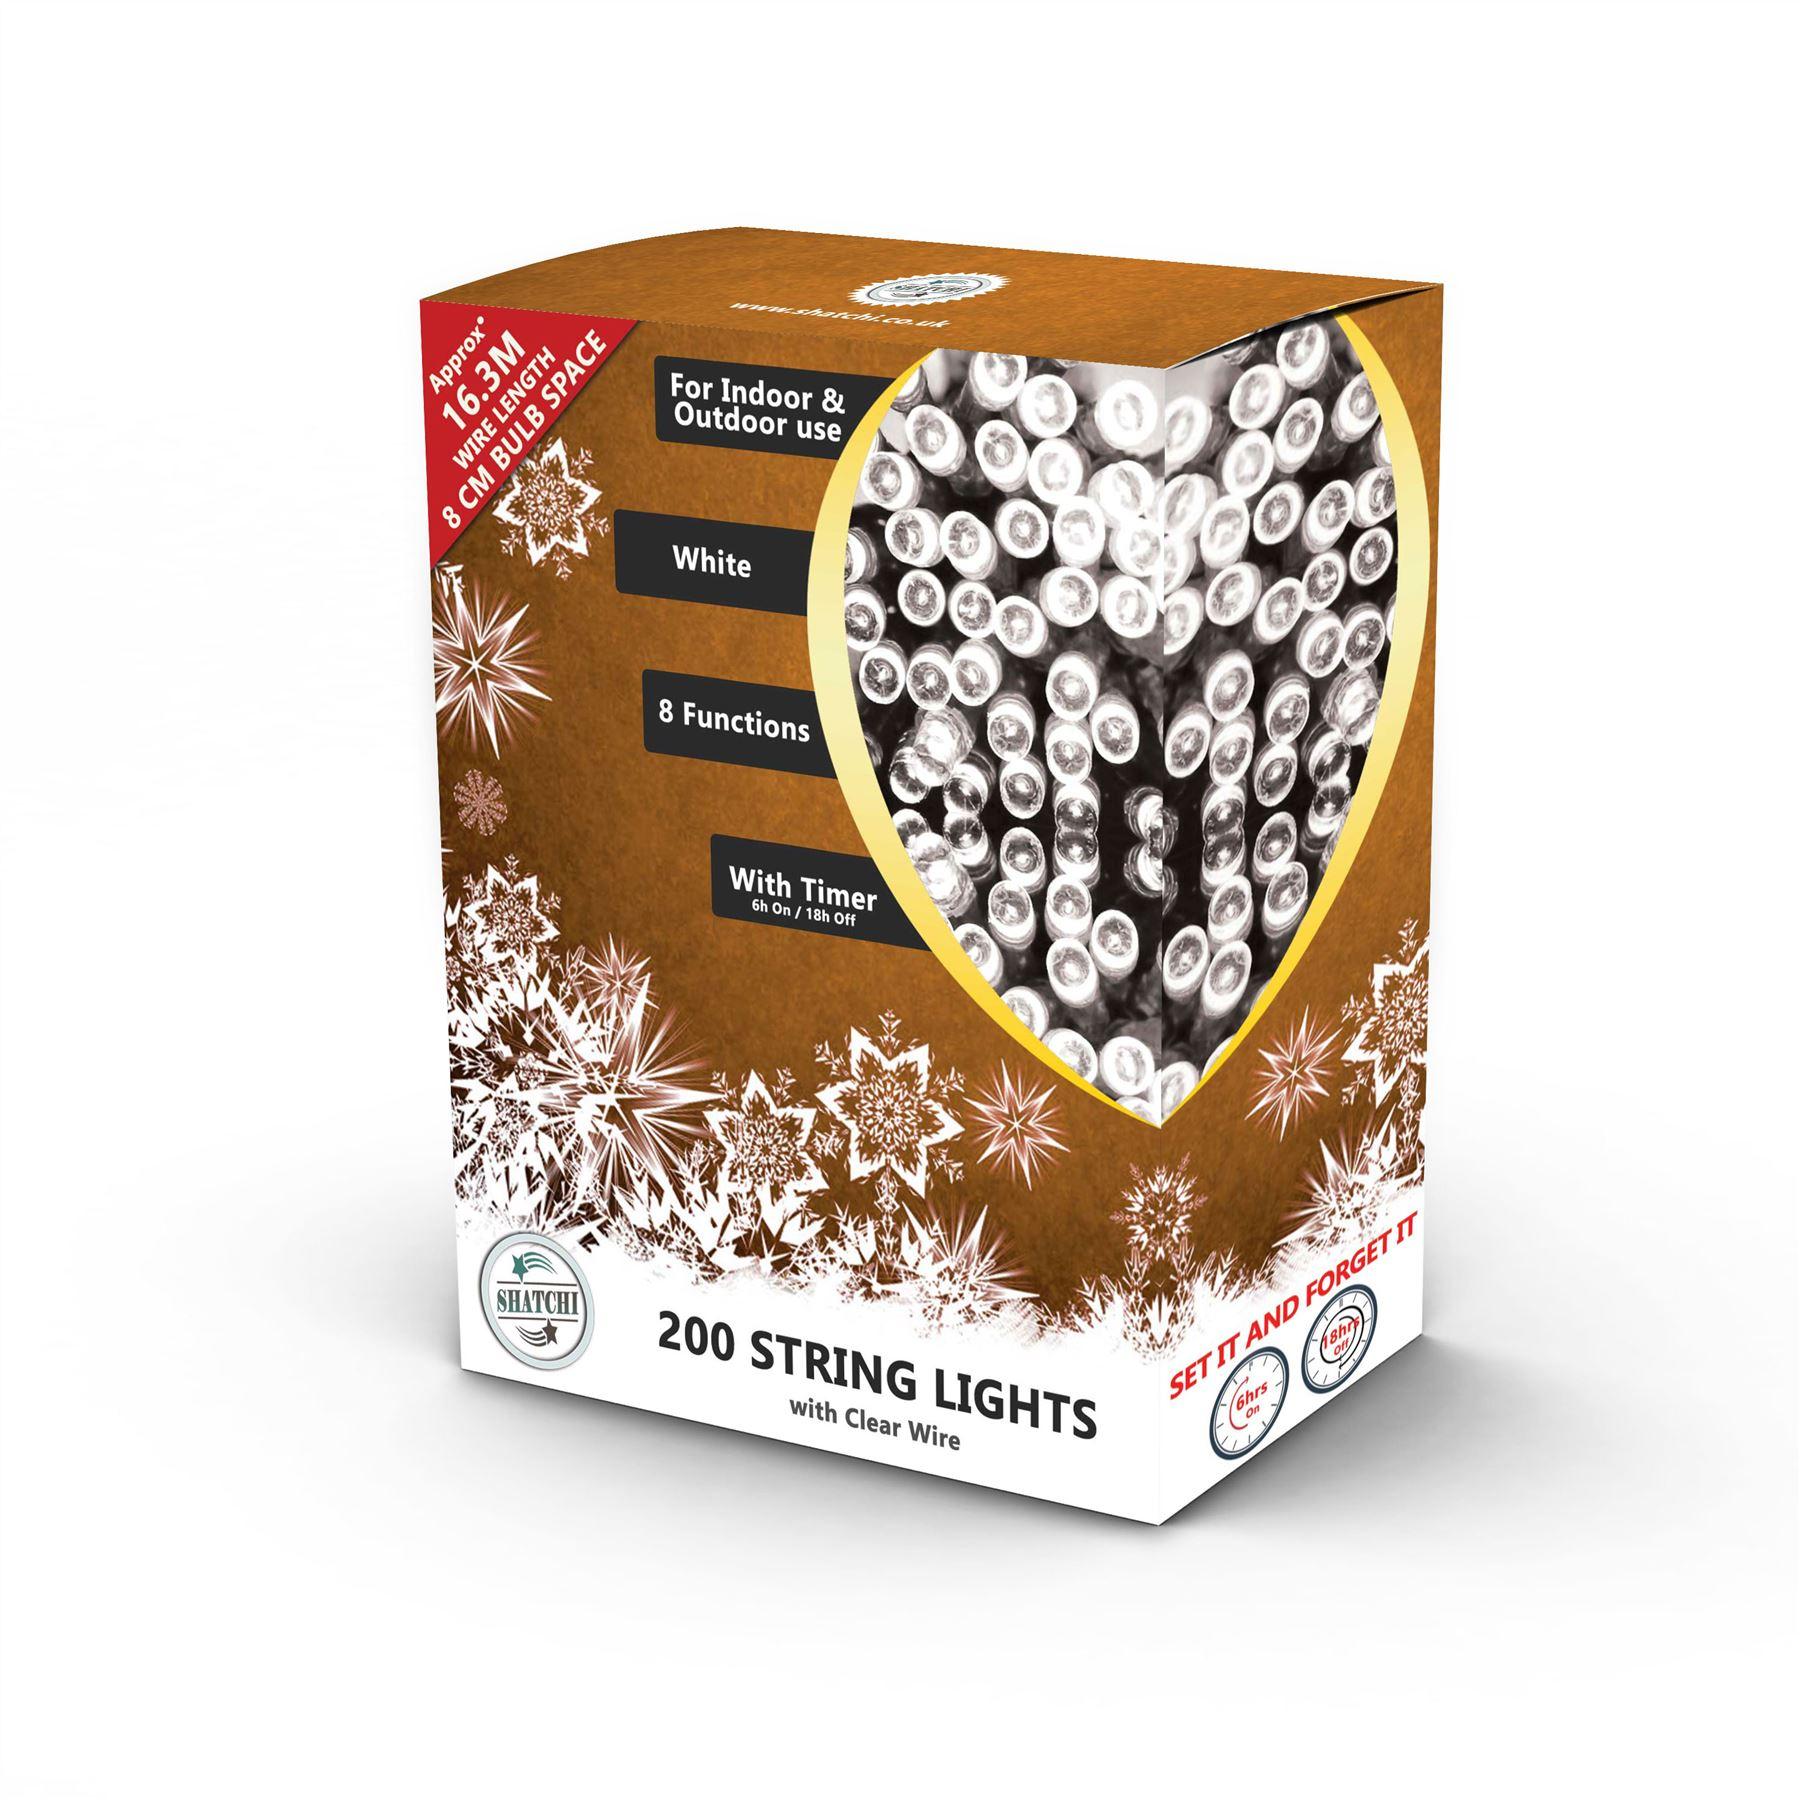 100-200-300-400-500-LED-Christmas-String-Fairy-Lights-Xmas-Decorations-Tree miniature 22